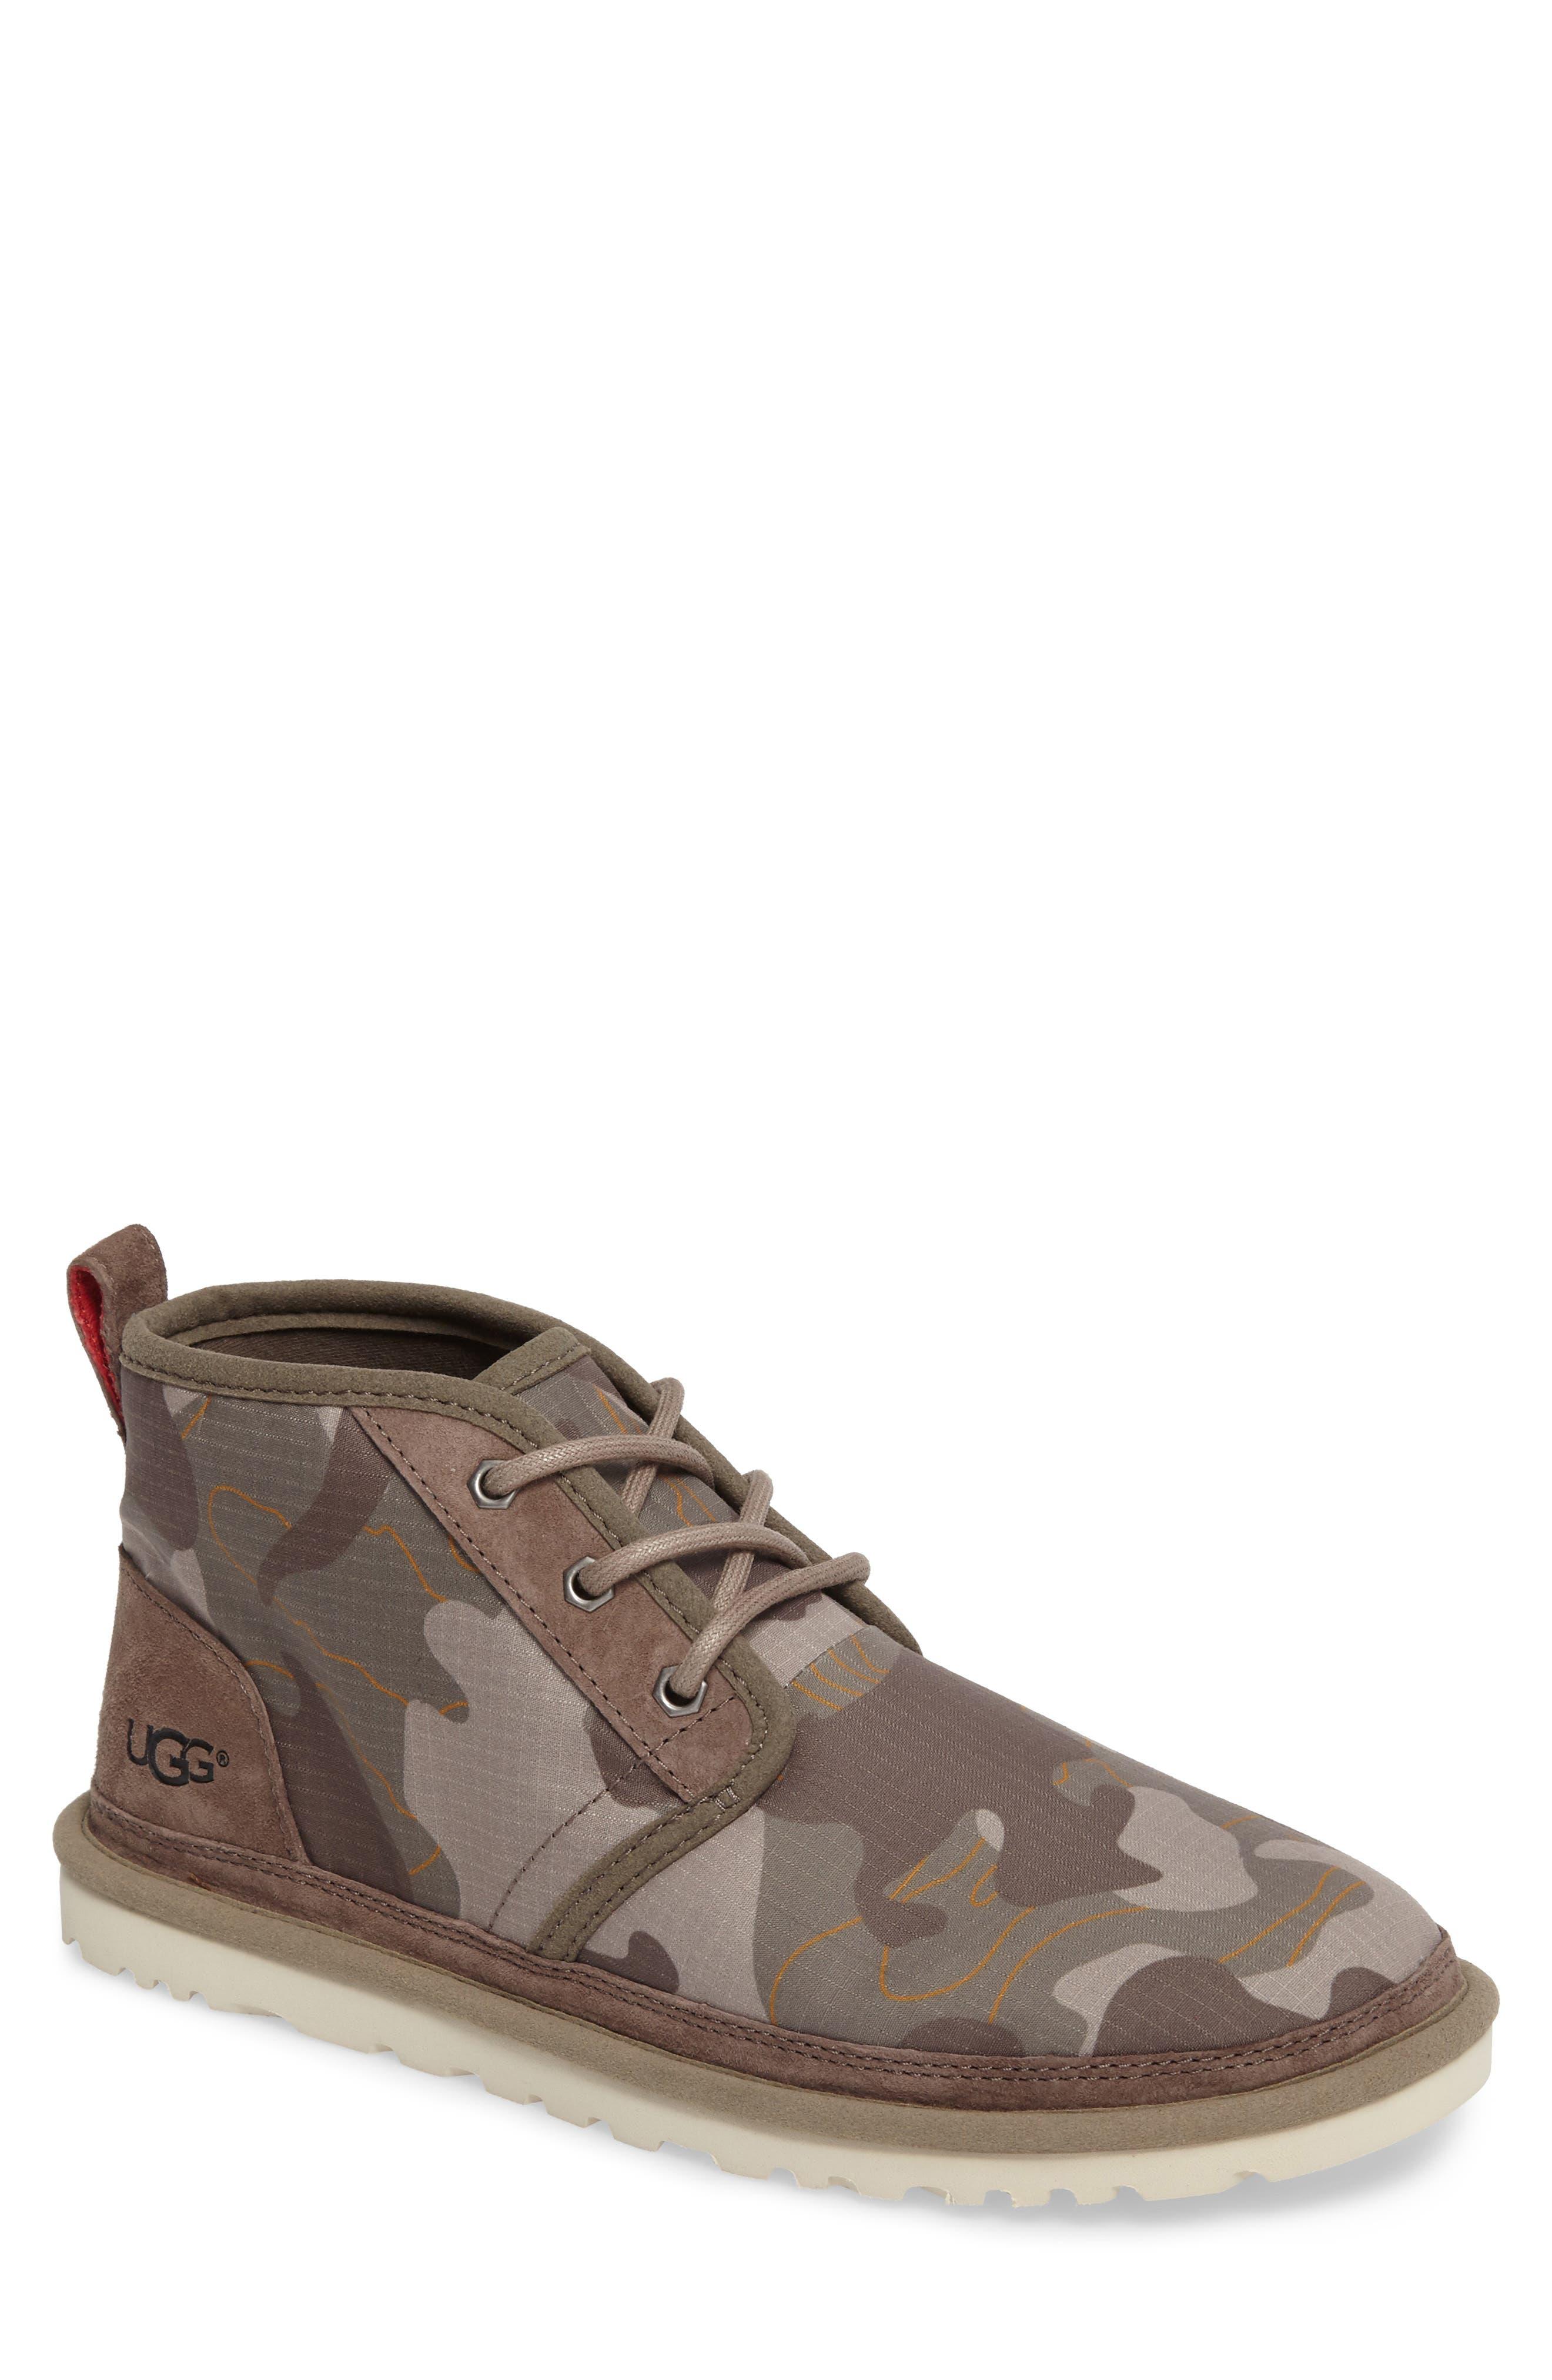 Neumel Camo Chukka Boot,                         Main,                         color, 063